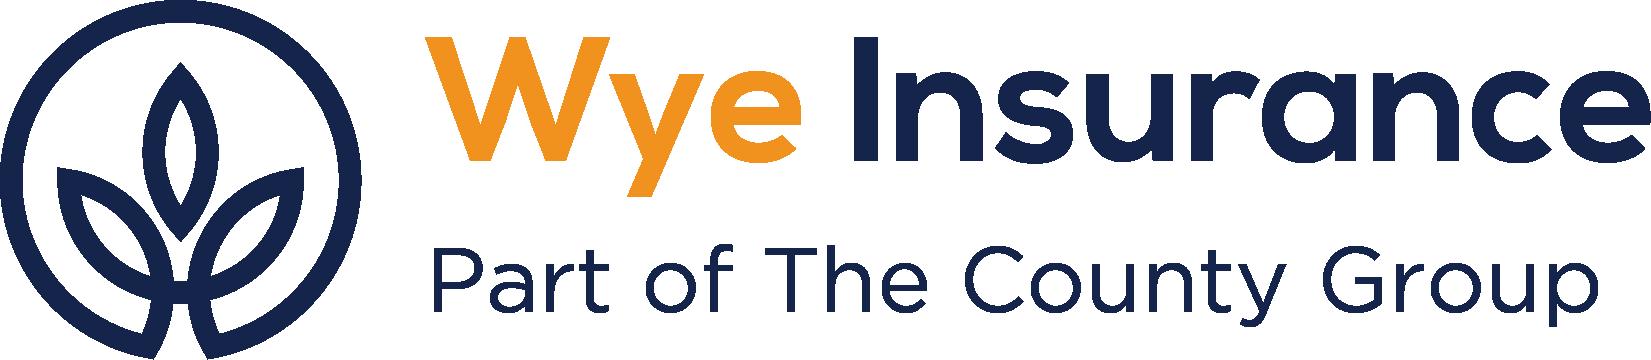 Wye Insurance